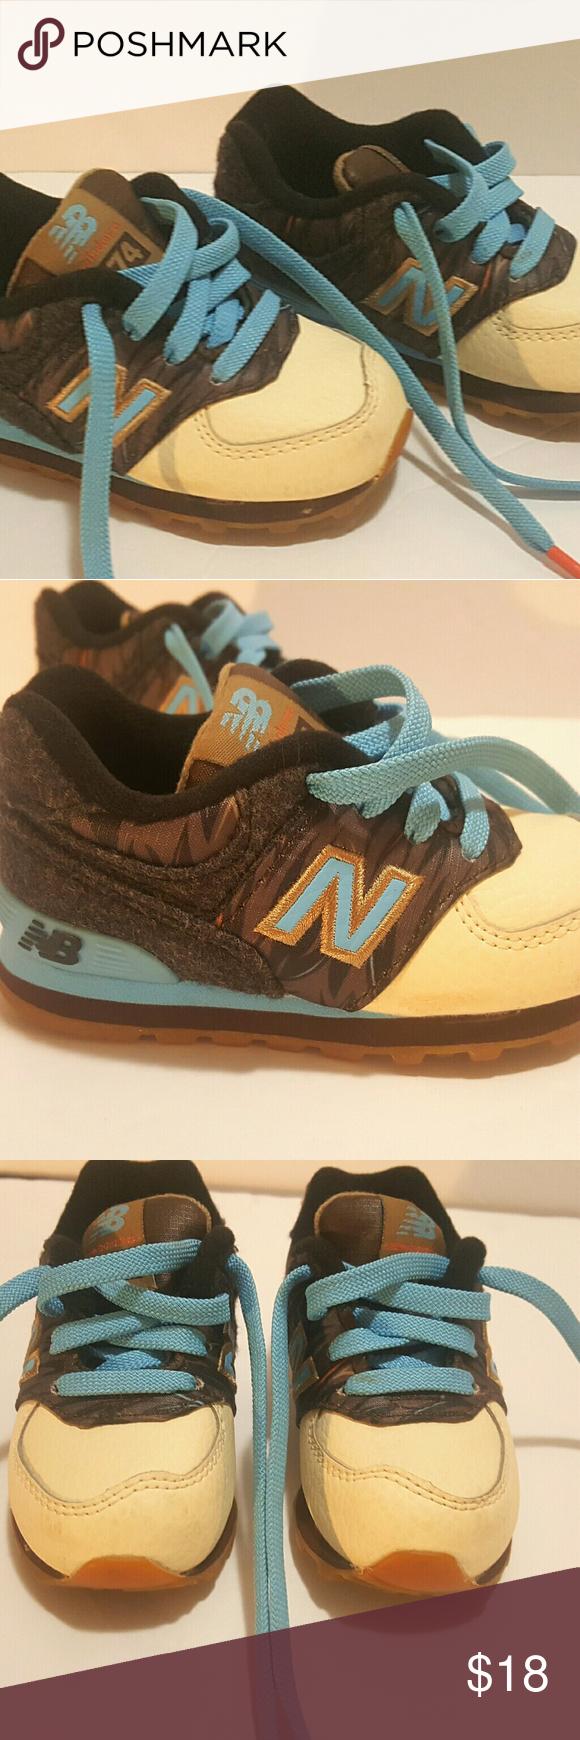 New Balance 574 Classics Shoes Size 5.5